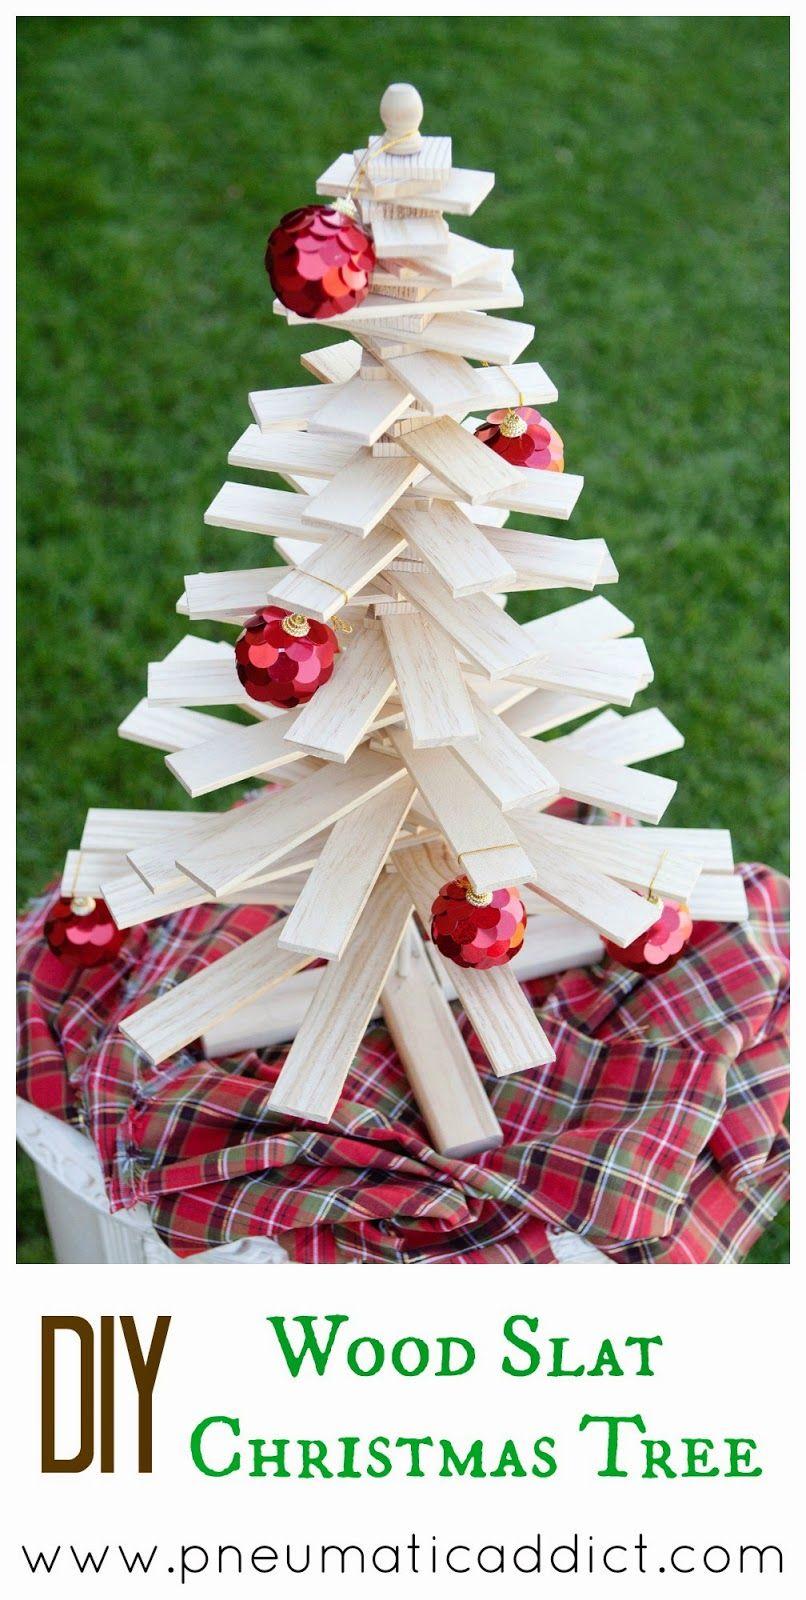 Hometalk diy christmas window decoration - Learn To Make Your Own Diy Wood Slat Christmas Tree Tutorial And Cut List Found